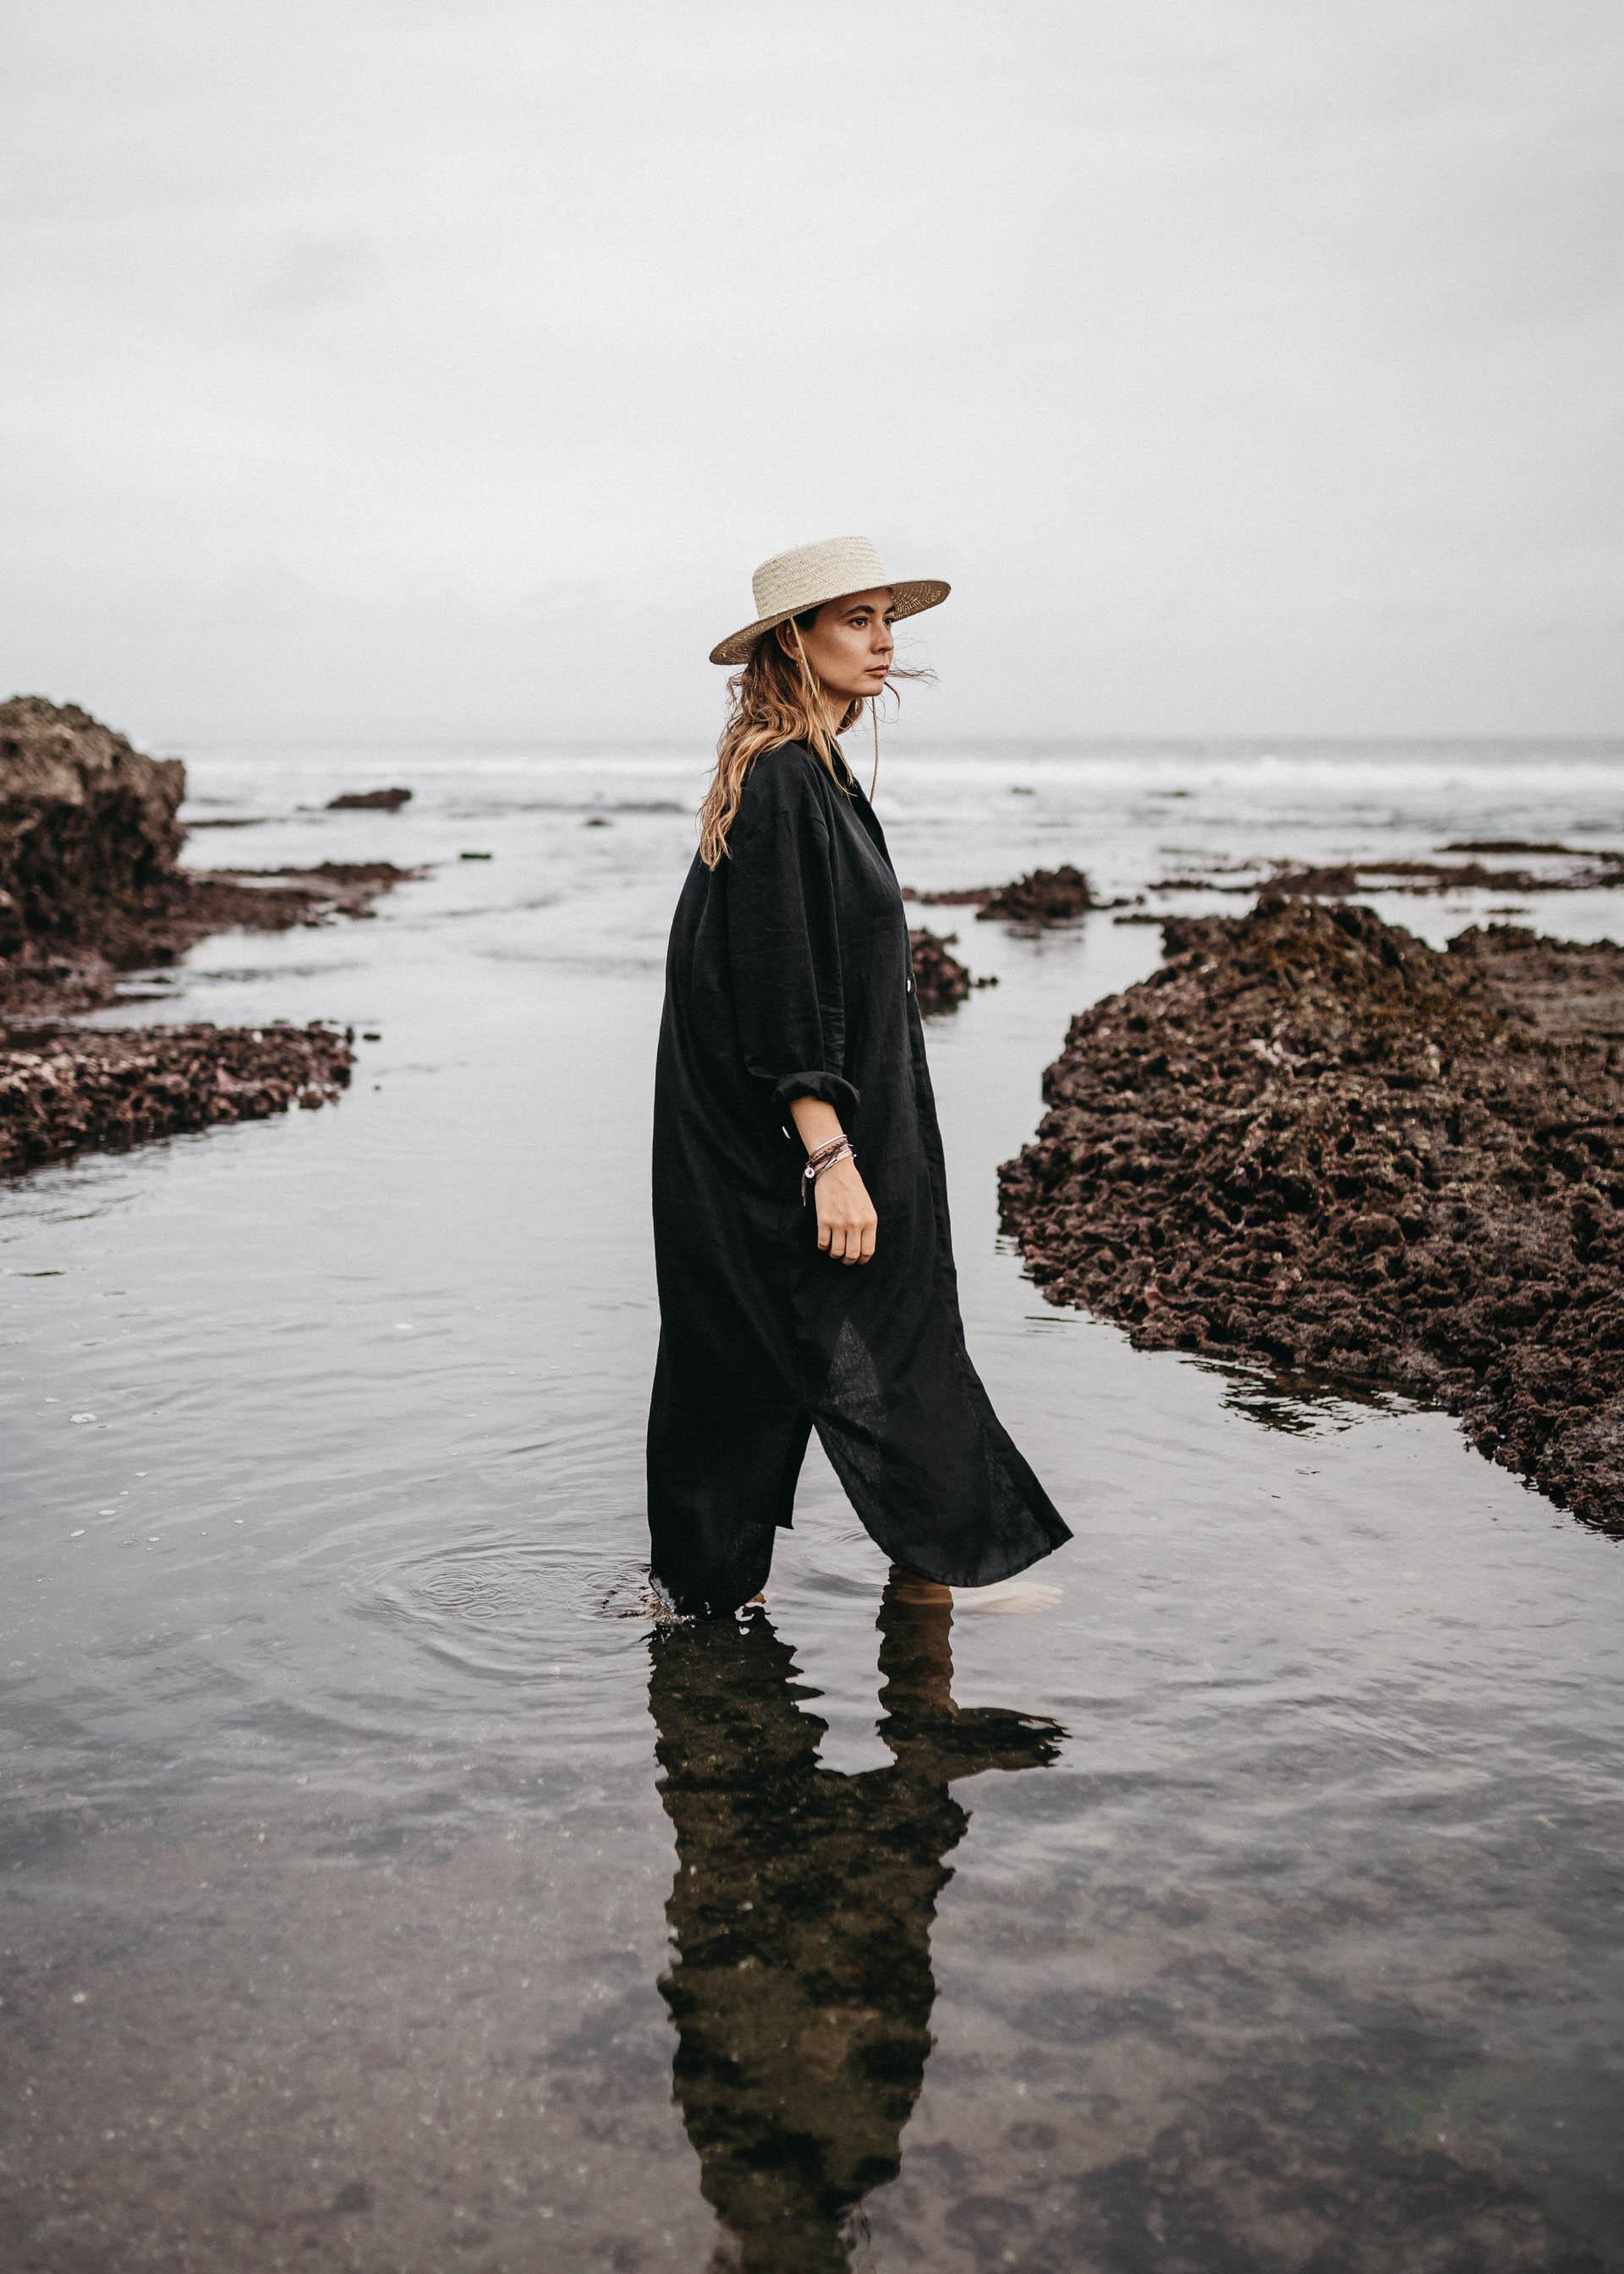 keira-mason-studio-karma-beach-black-dress-in-water.jpg